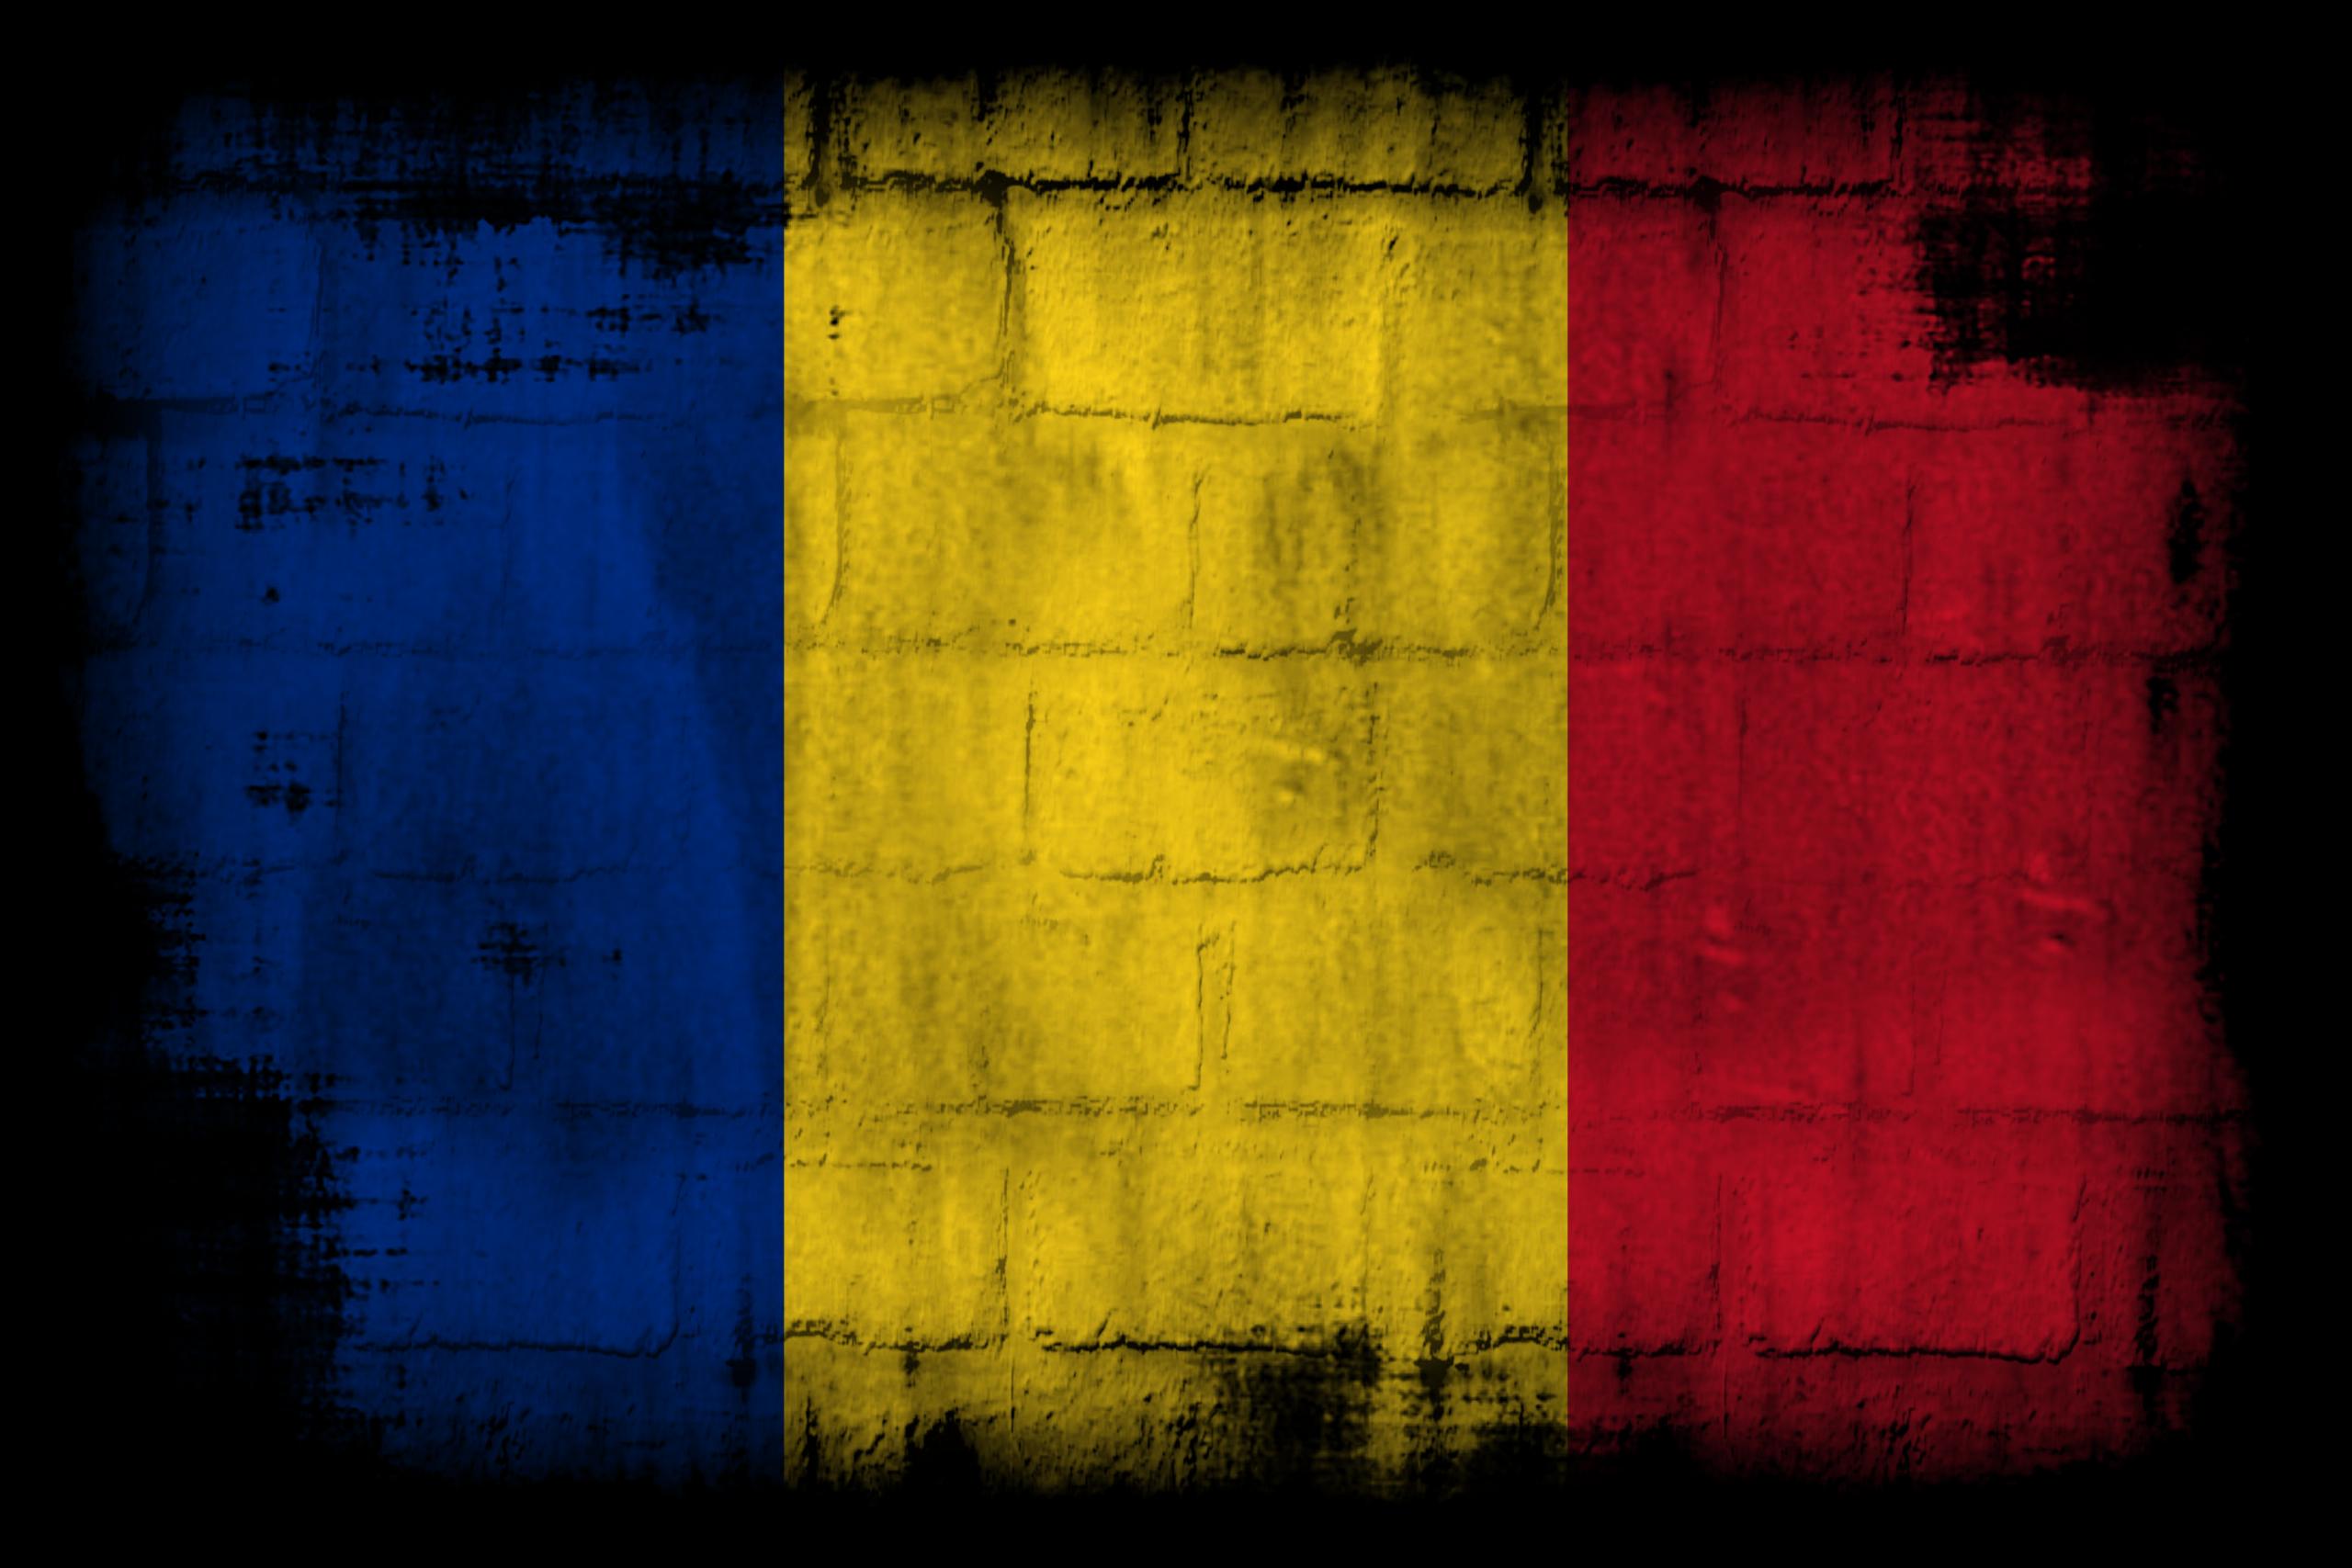 румыния флаг фото бывают типы виды